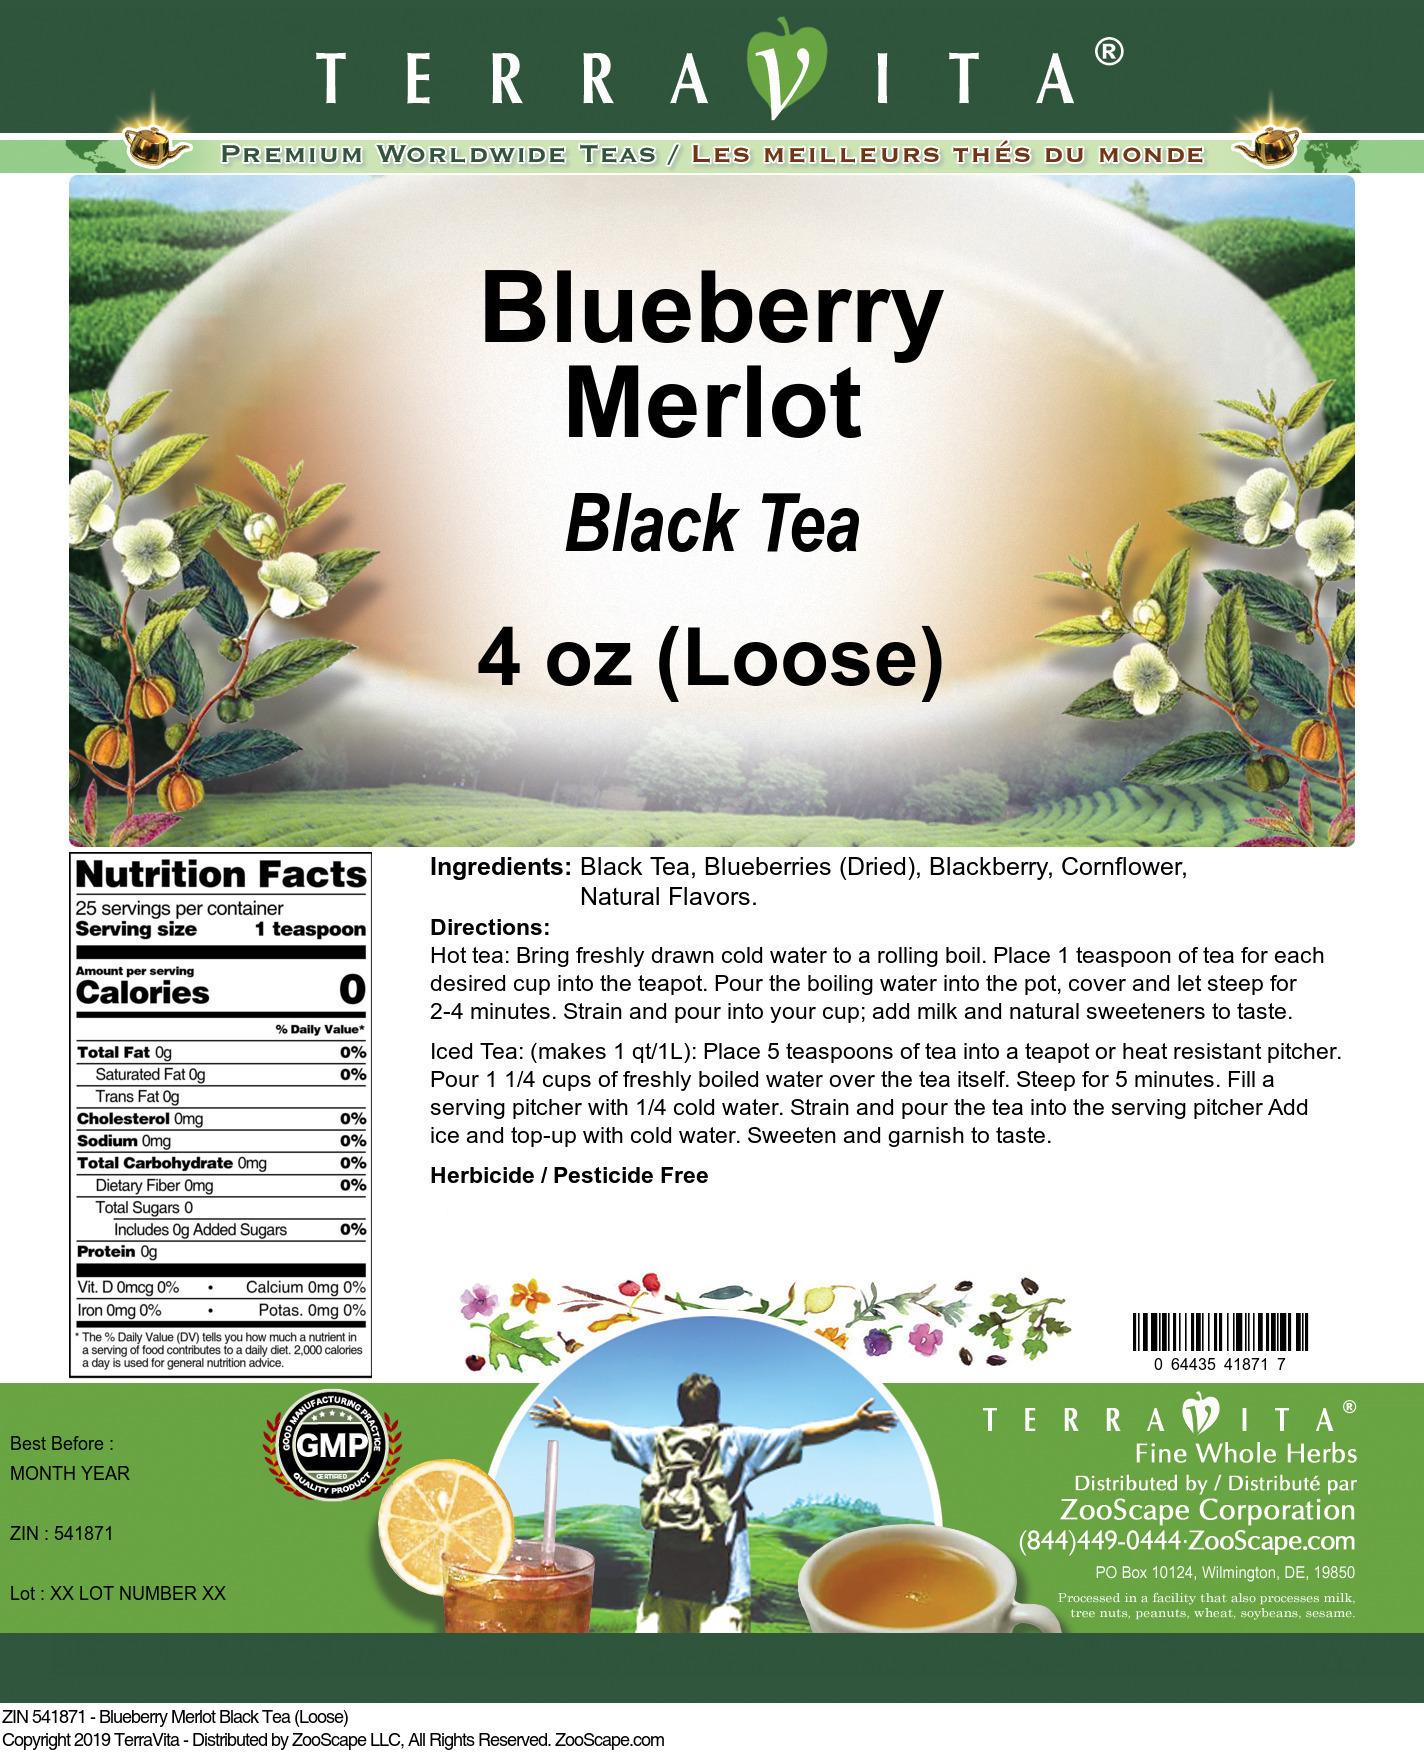 Blueberry Merlot Black Tea (Loose)